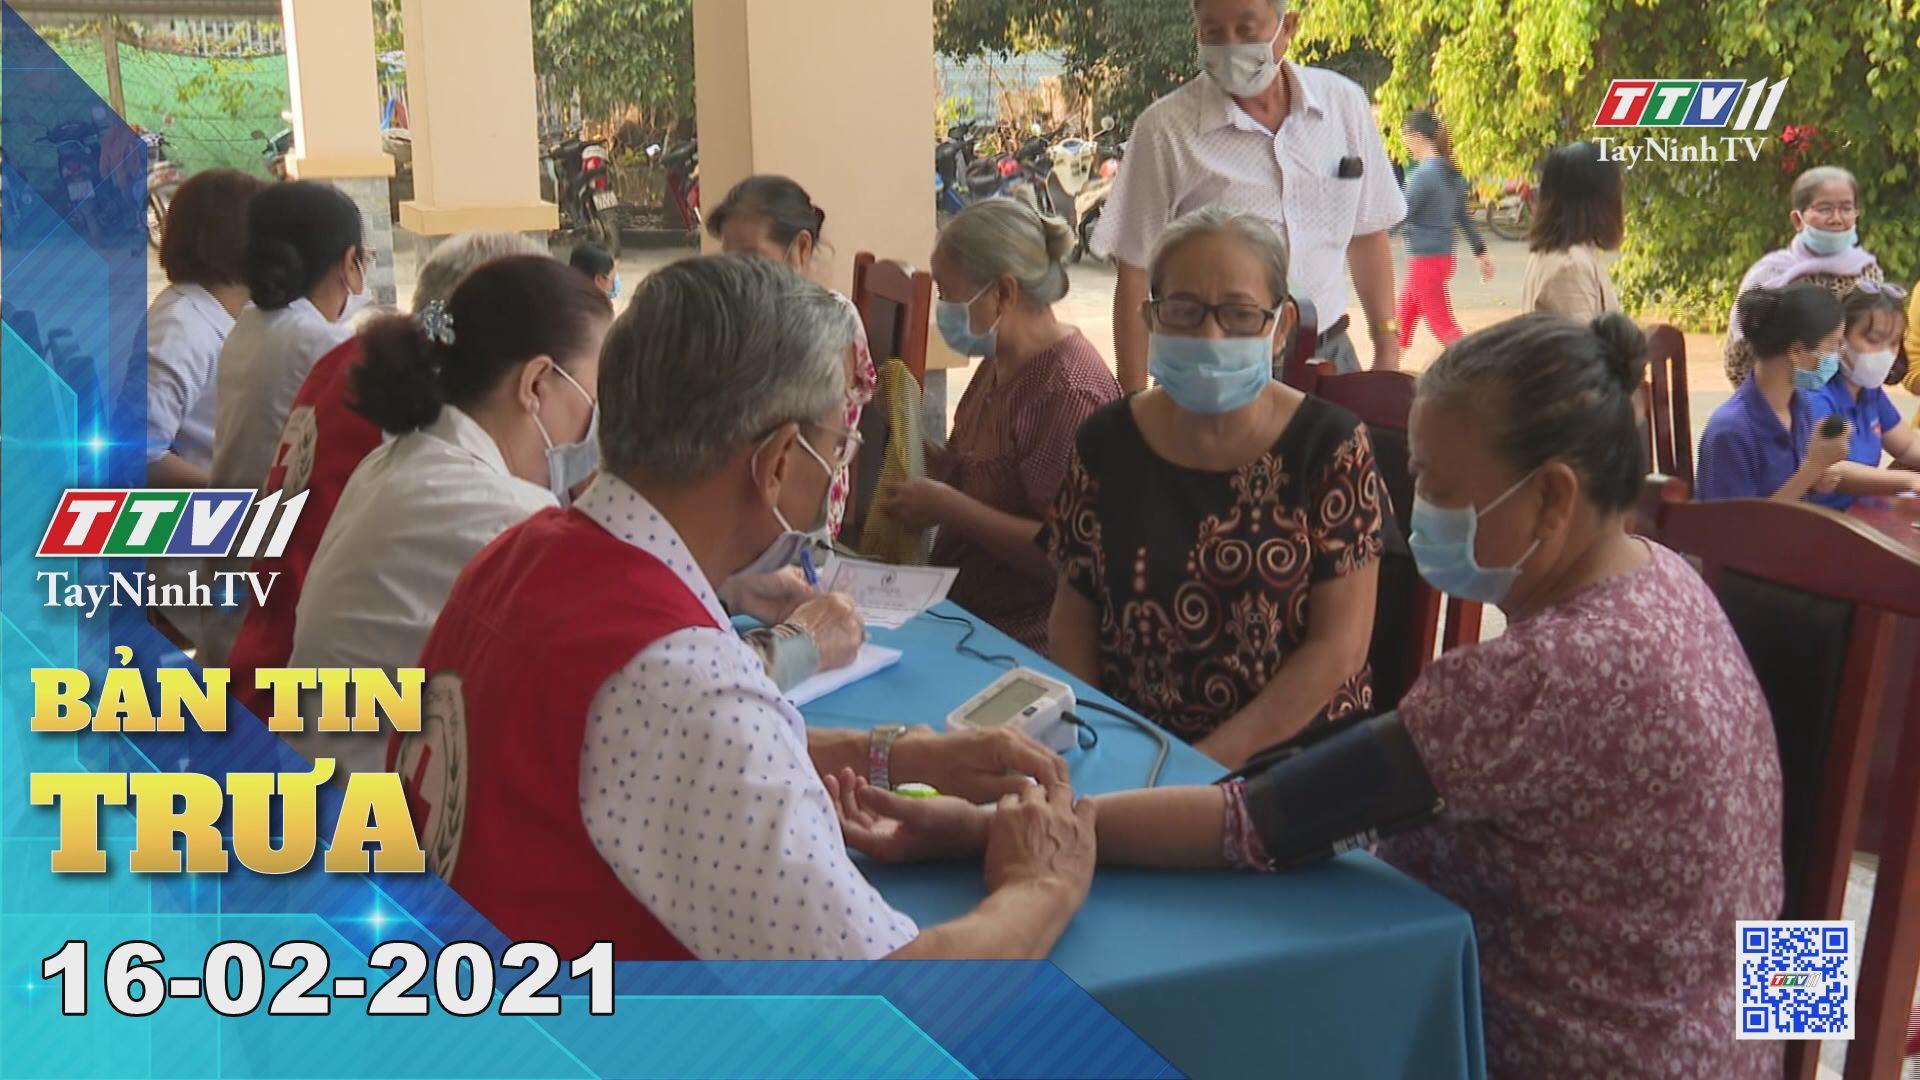 Bản tin trưa 16-02-2021 | Tin tức hôm nay | TayNinhTV